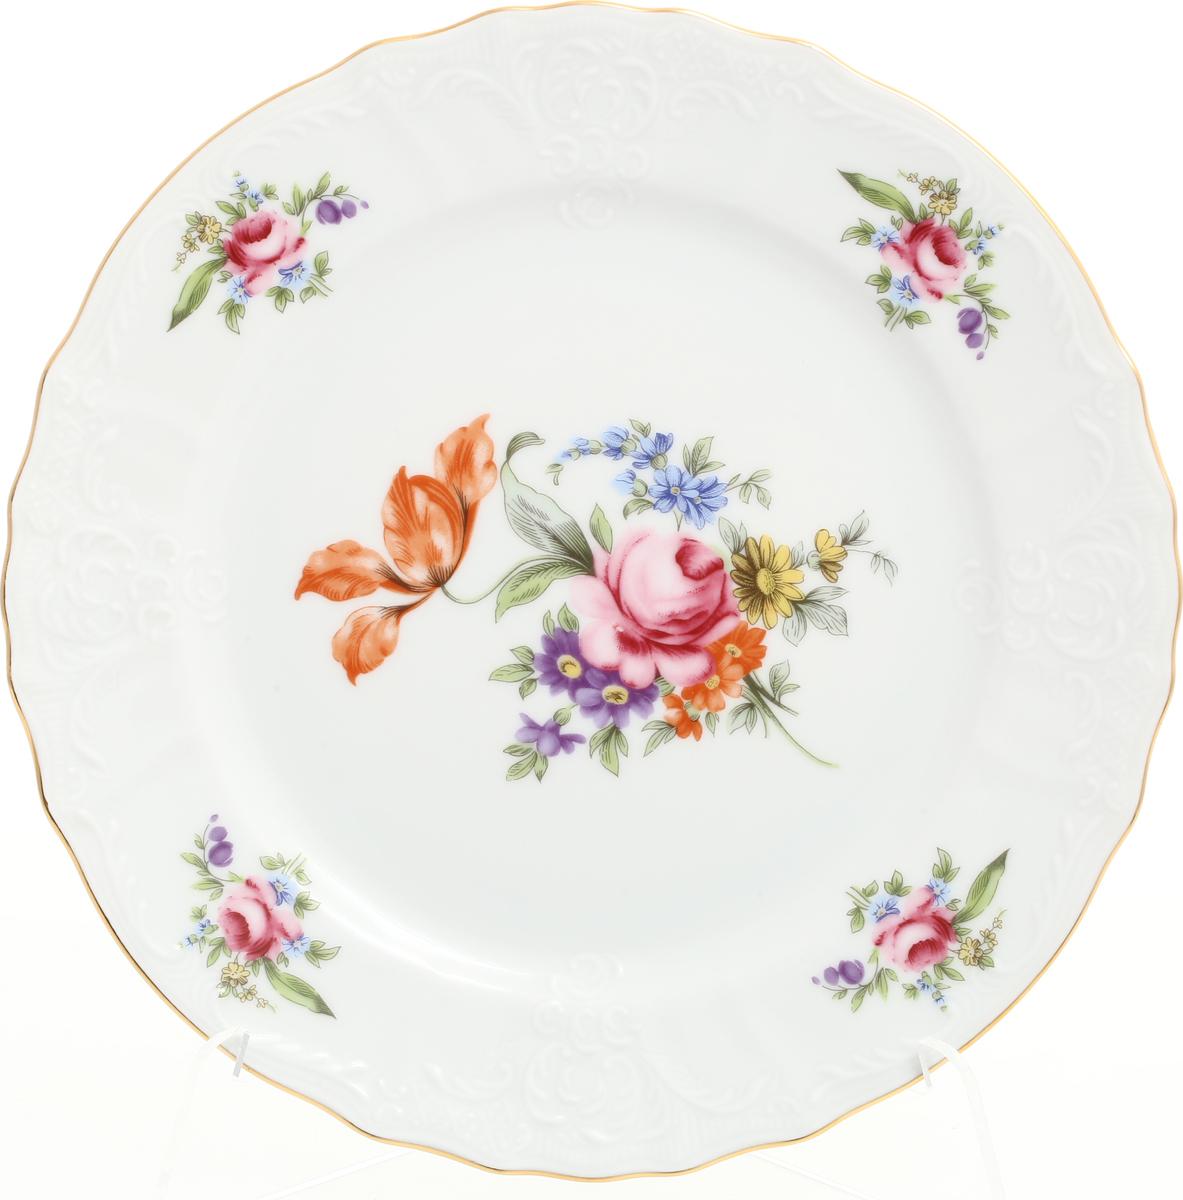 Набор тарелок Bernadotte Полевой цветок, диаметр 21 см, 6 шт